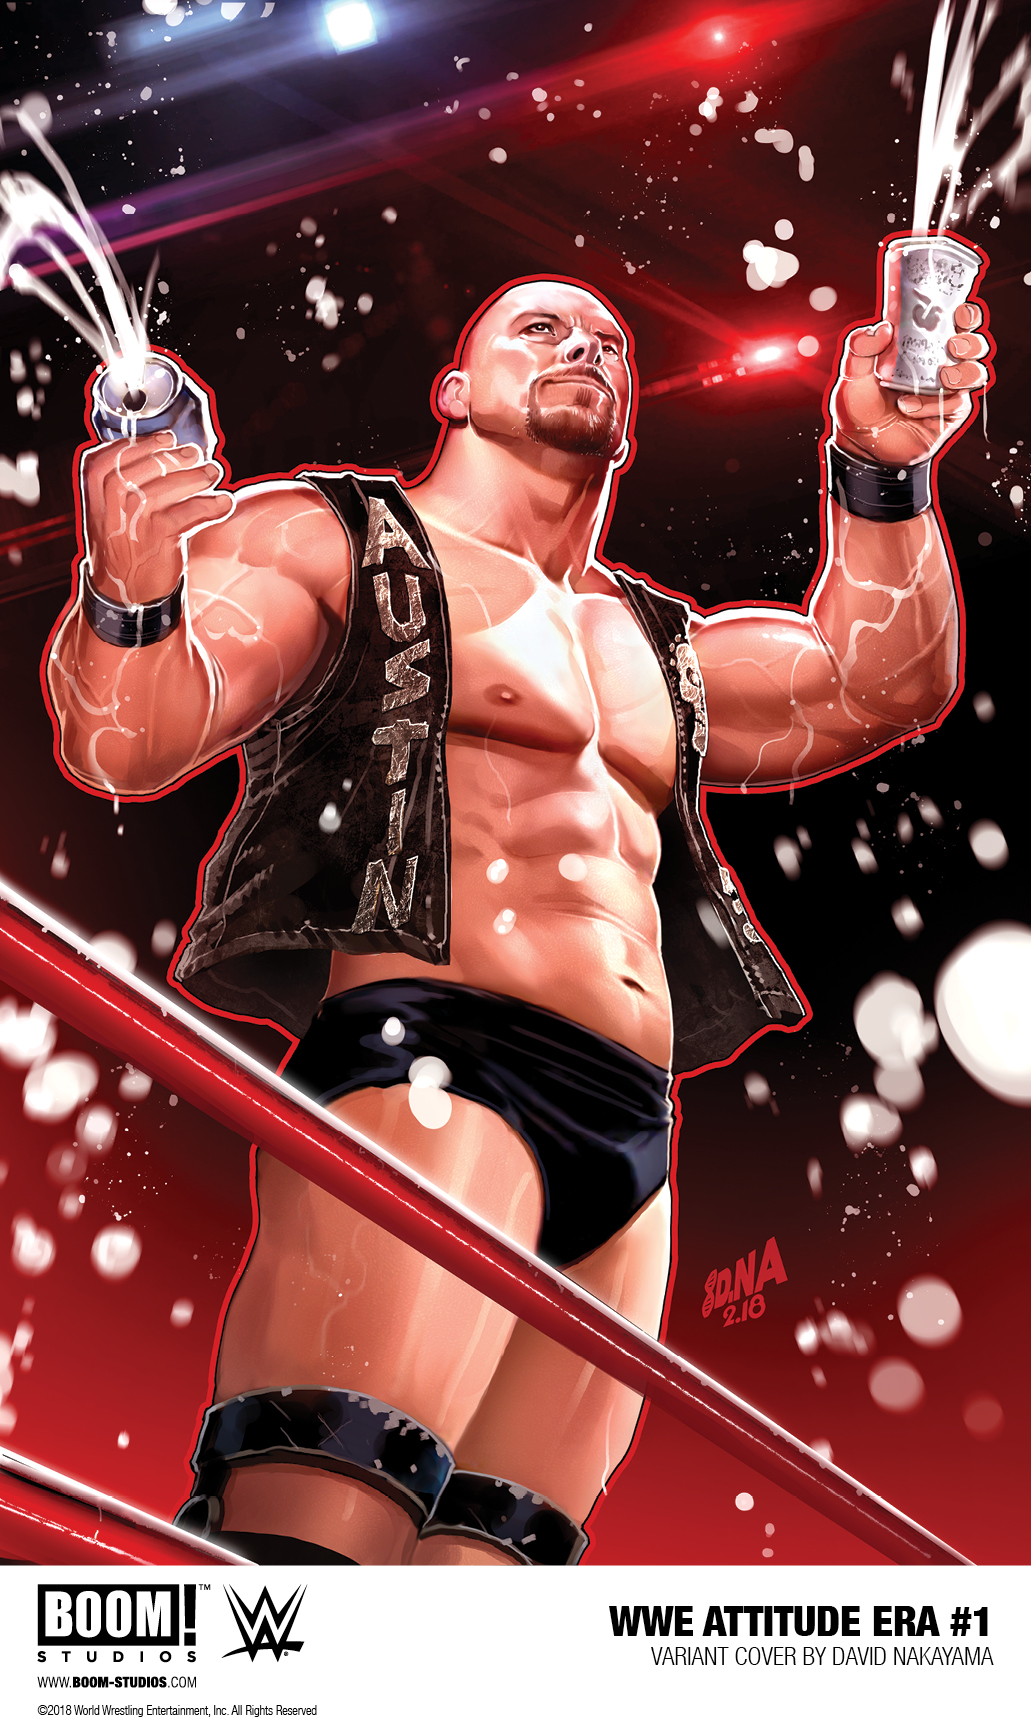 WWE_AttitudeEra_001_Variant2_PROMO.jpg